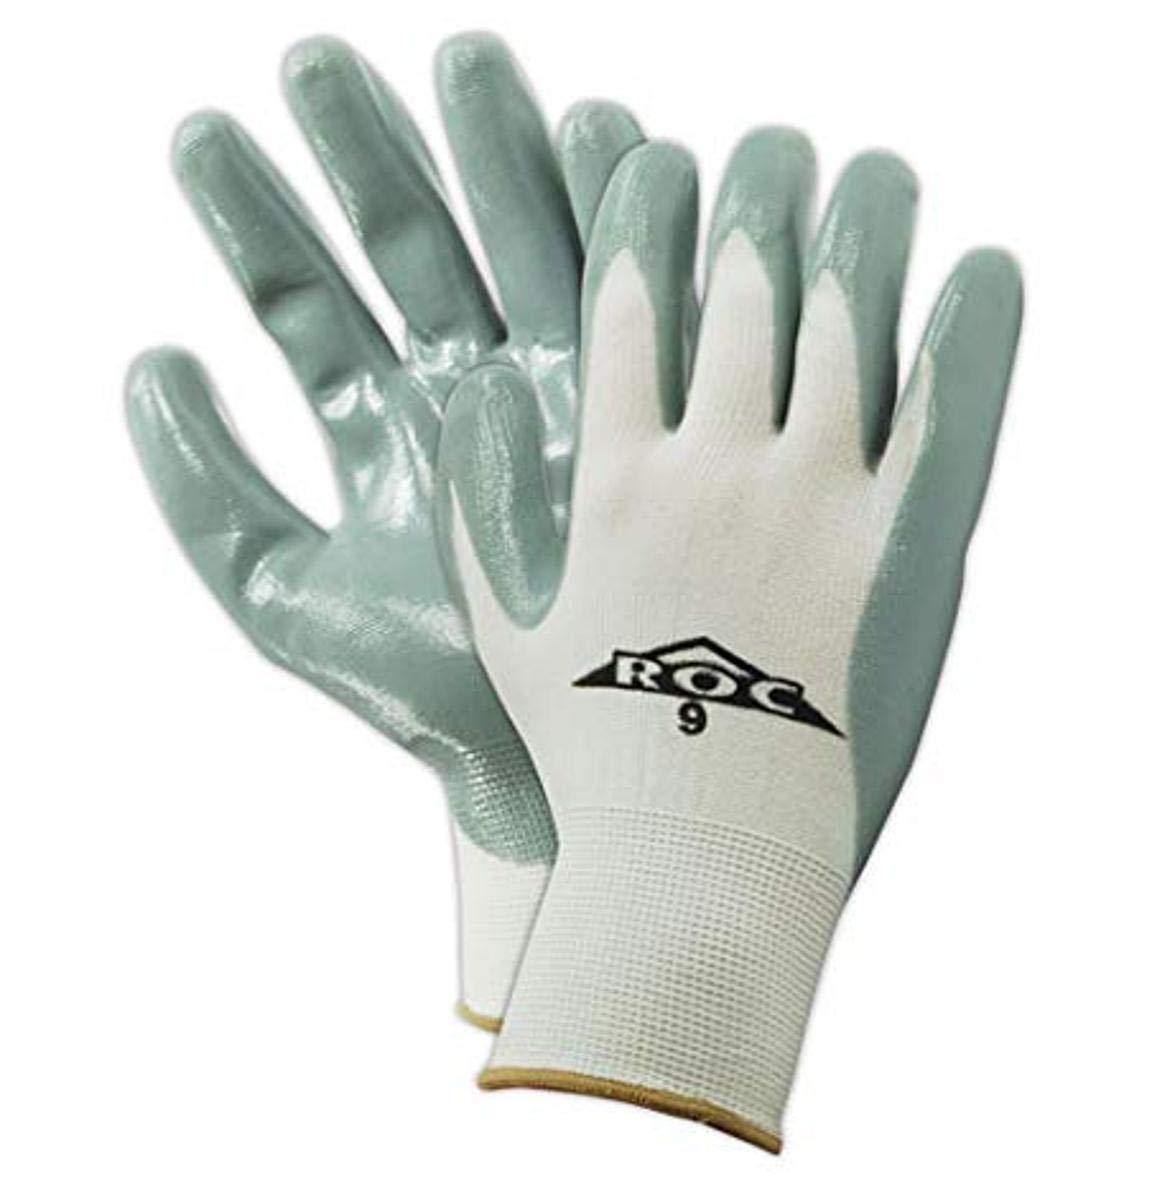 MAGID ROC GP160 Nylon Glove, Gray Nitrile Palm Coating, Knit Wrist Cuff, 9.5